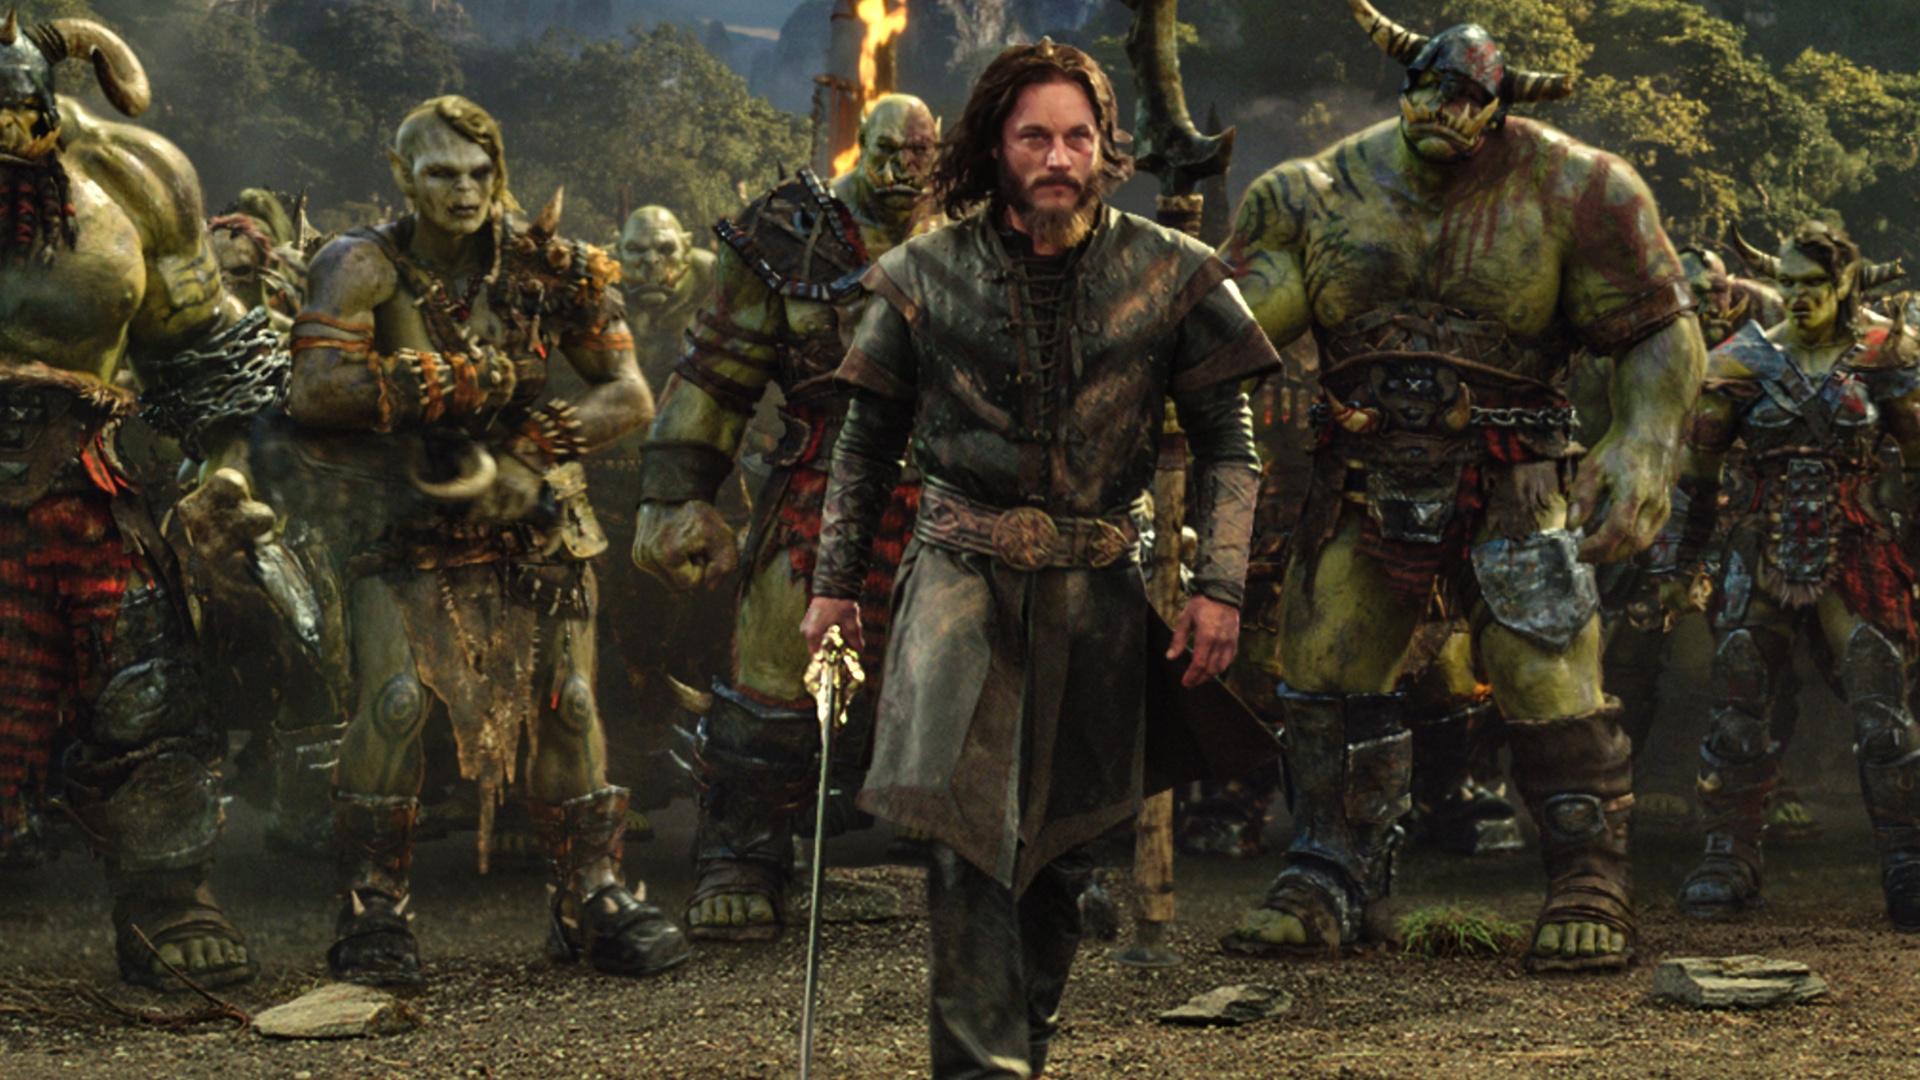 Warcraft 2 Film Release Date